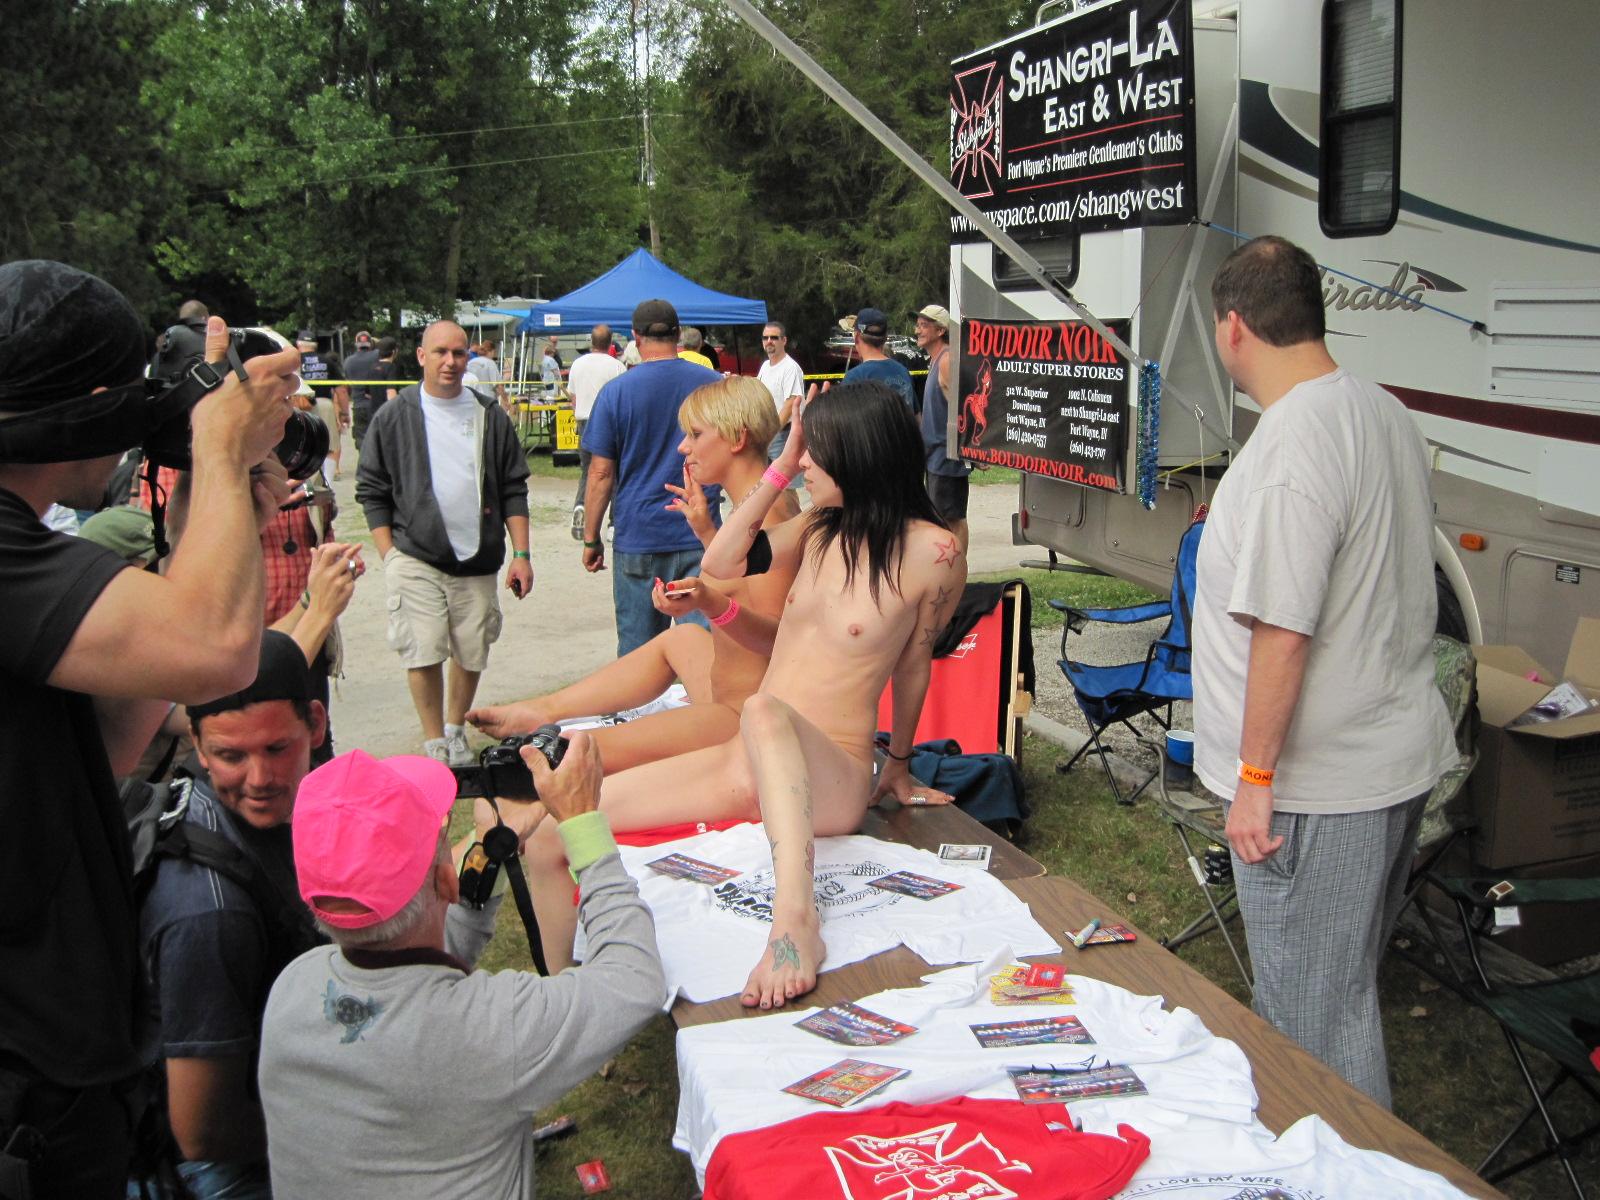 rochelle nudisten welt